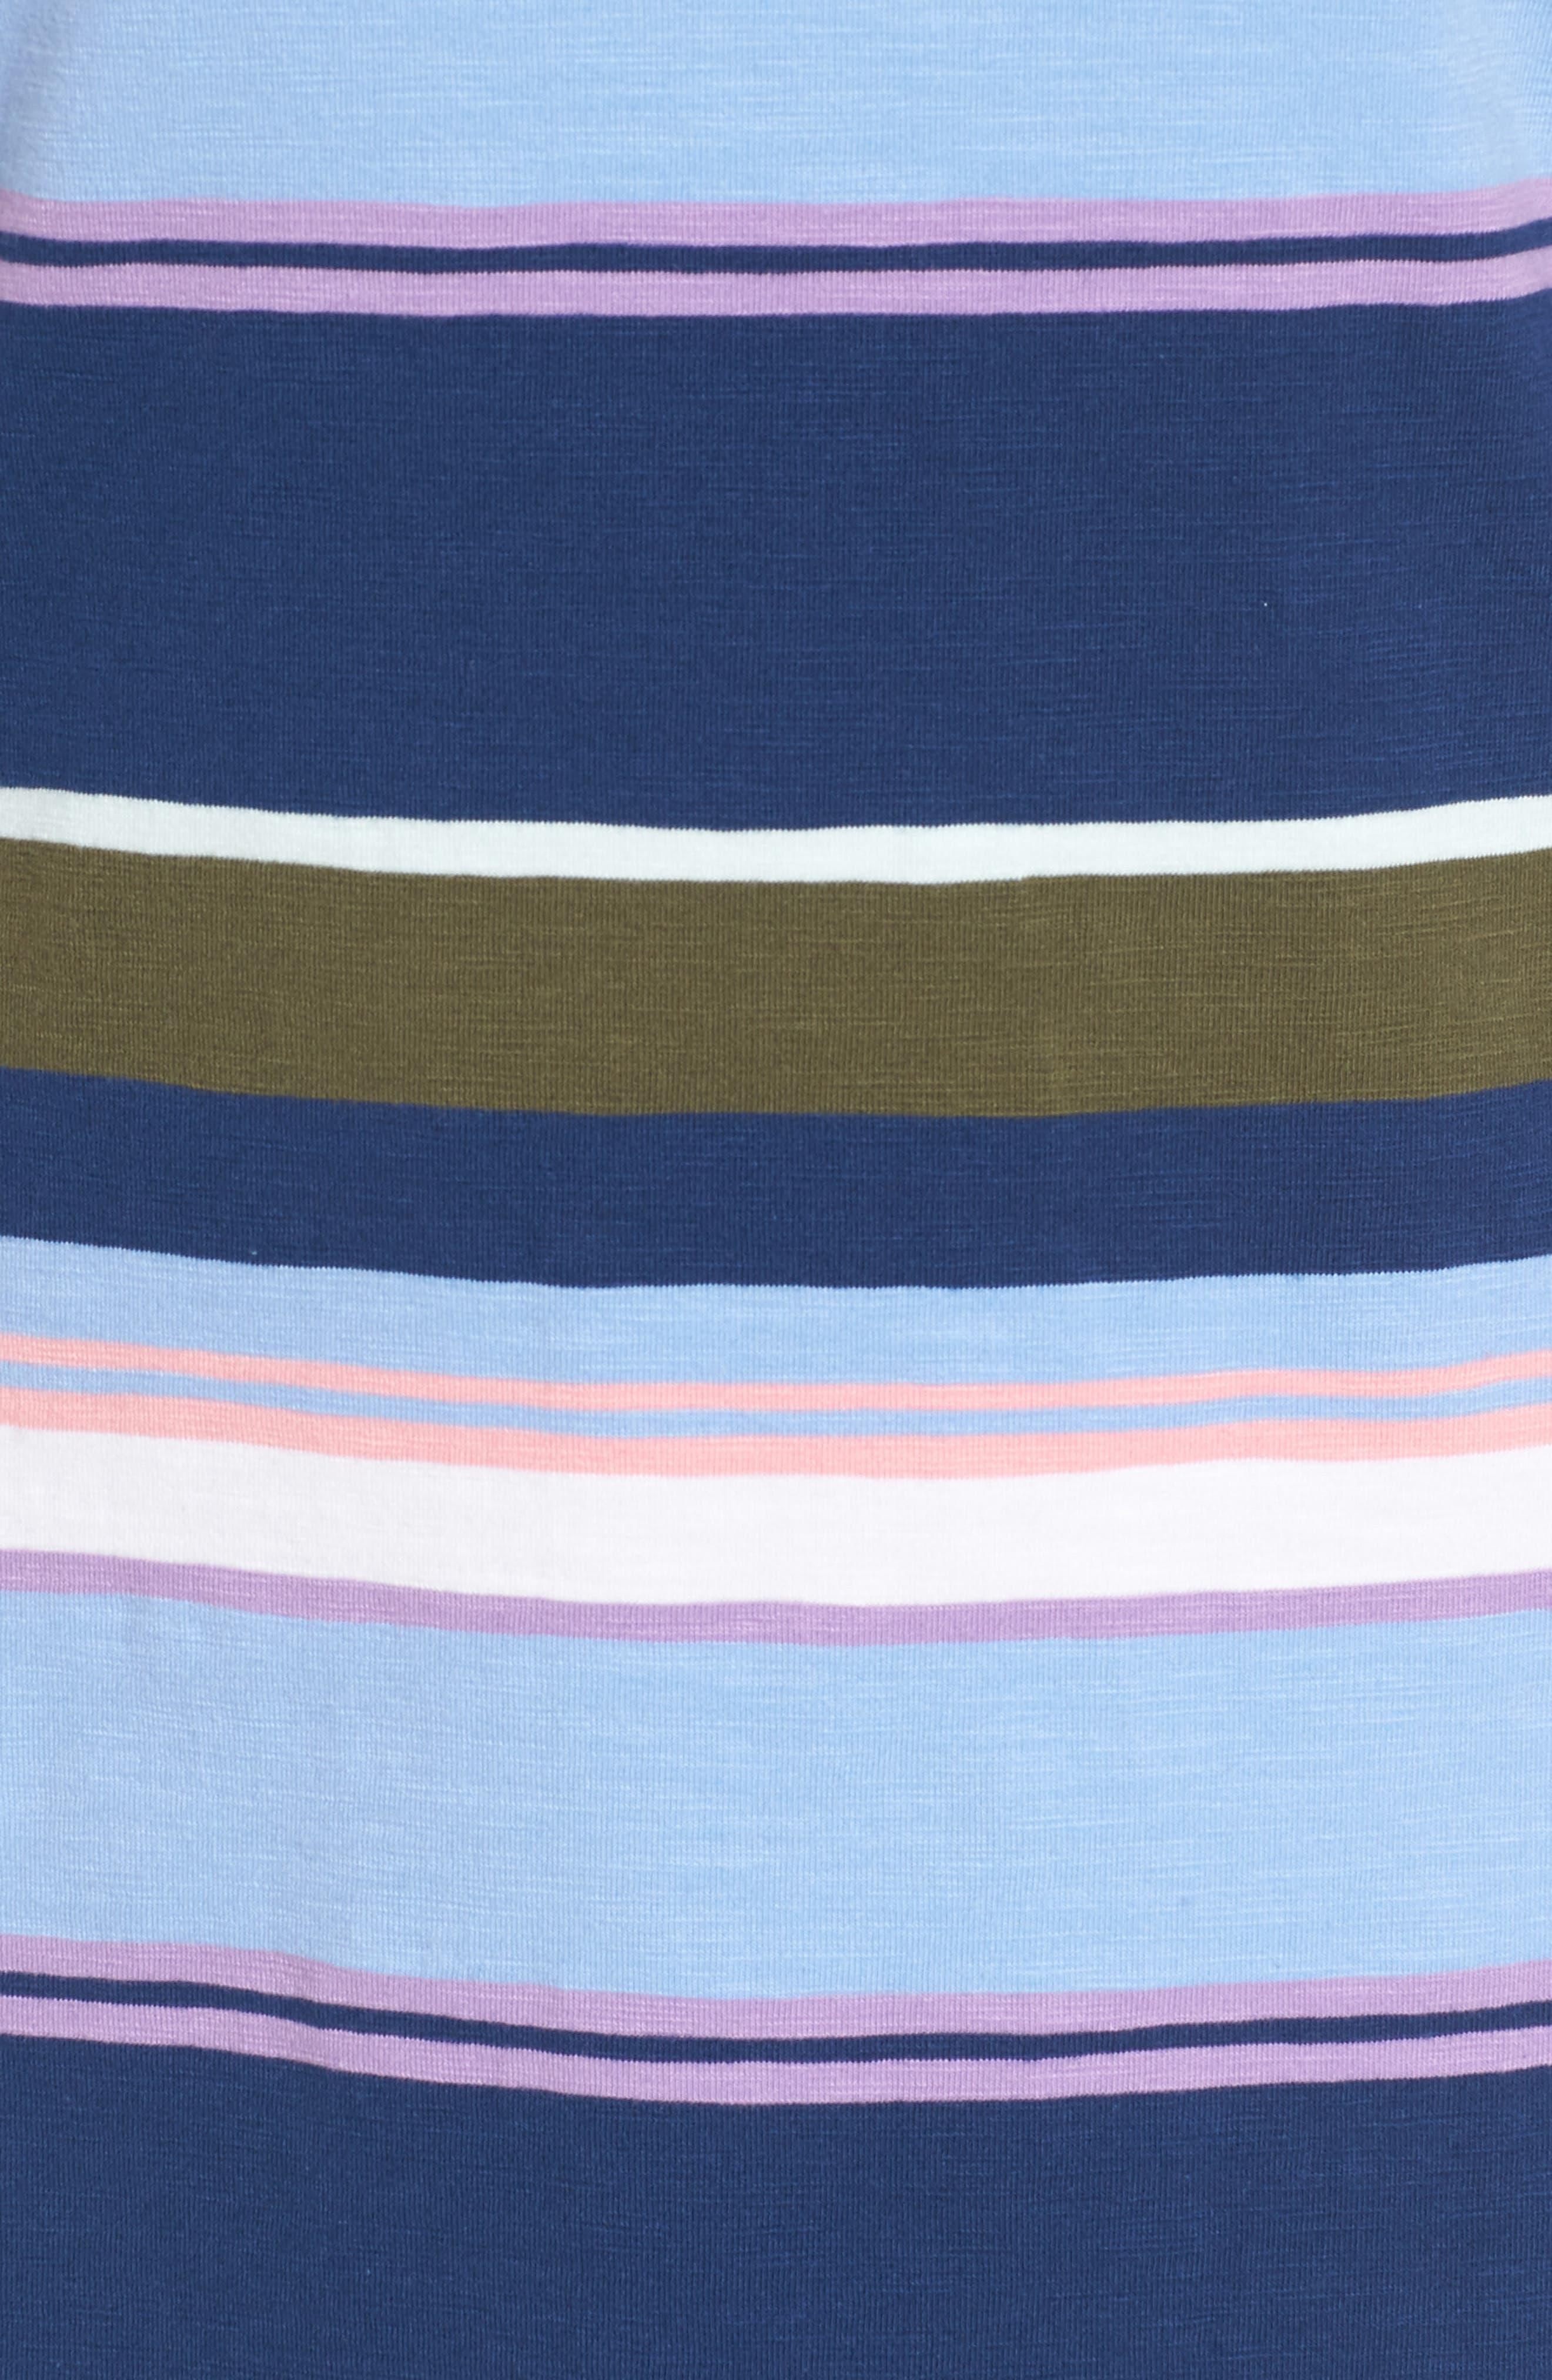 Stripe Scoop Neck Dress,                             Alternate thumbnail 5, color,                             Kingdom Blue